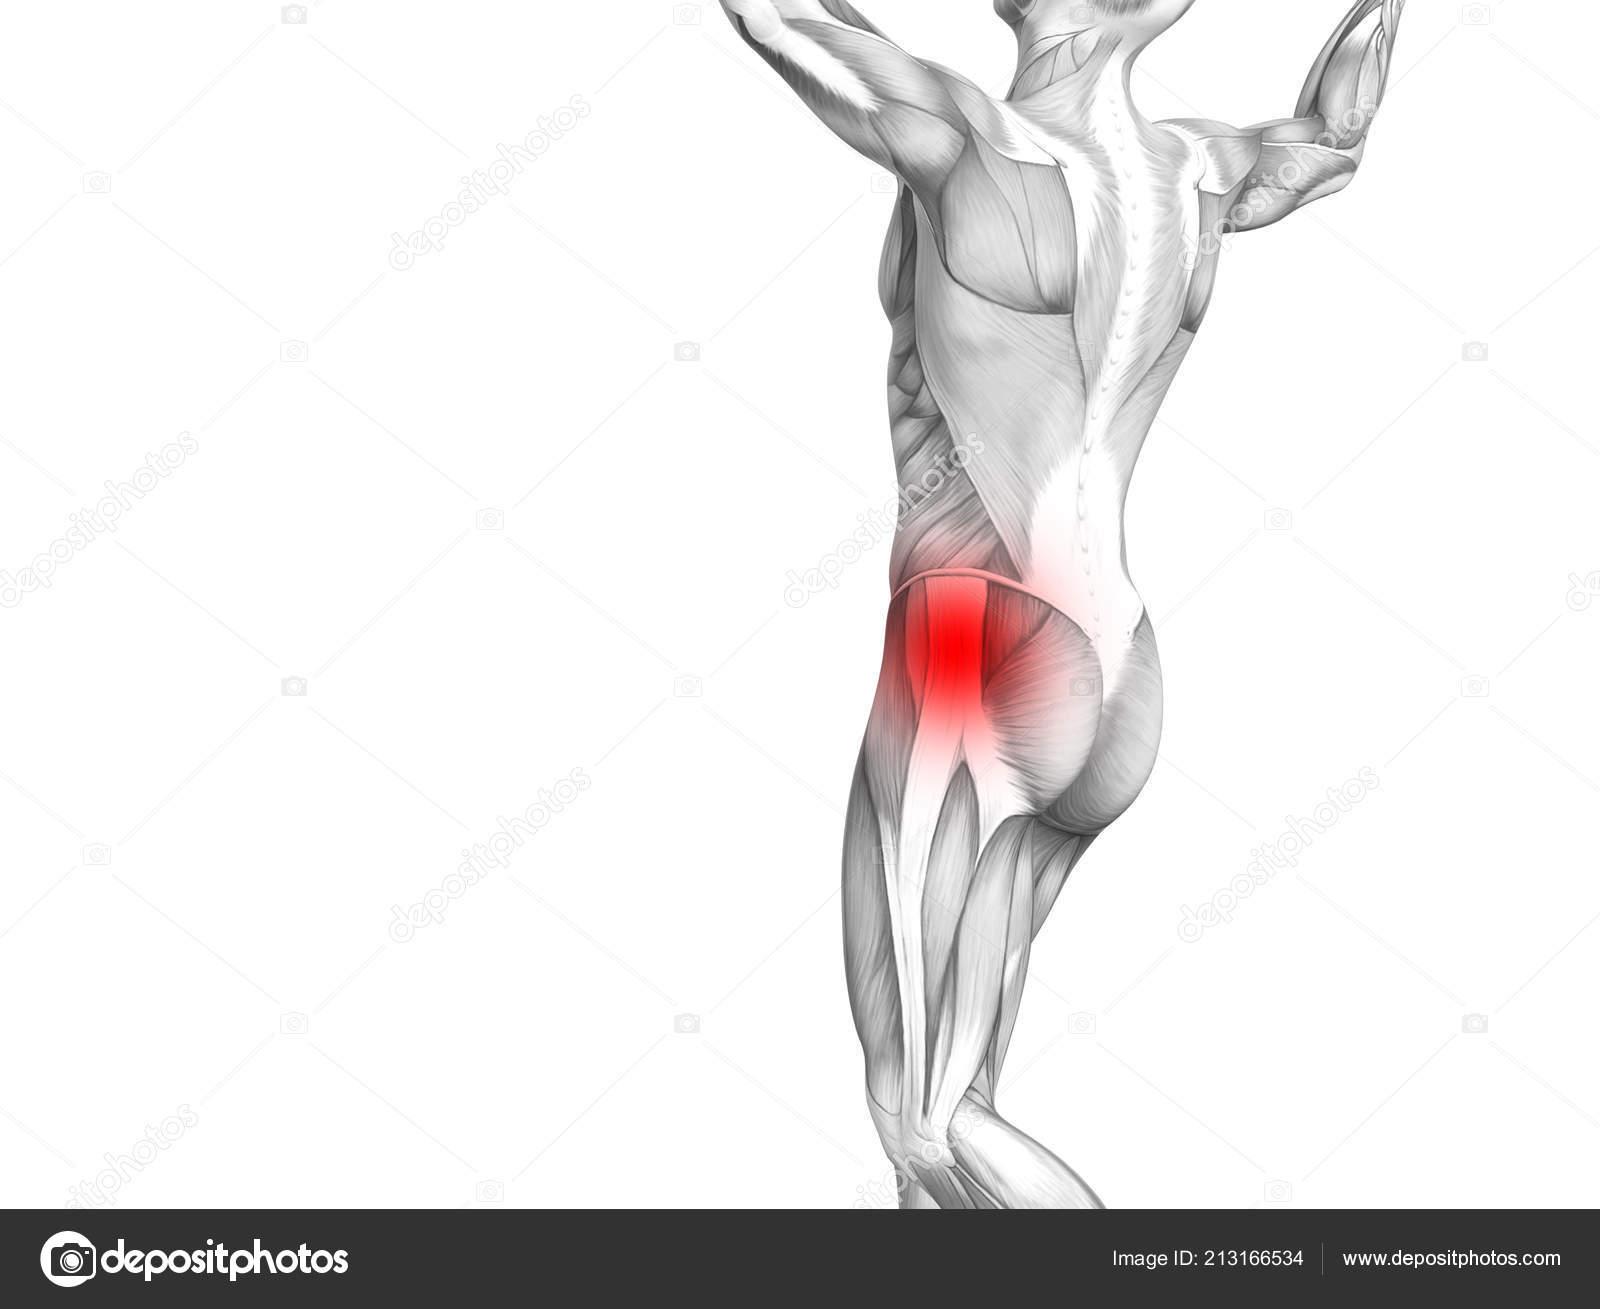 Conceptual Hip Human Anatomy Red Hot Spot Inflammation Articular